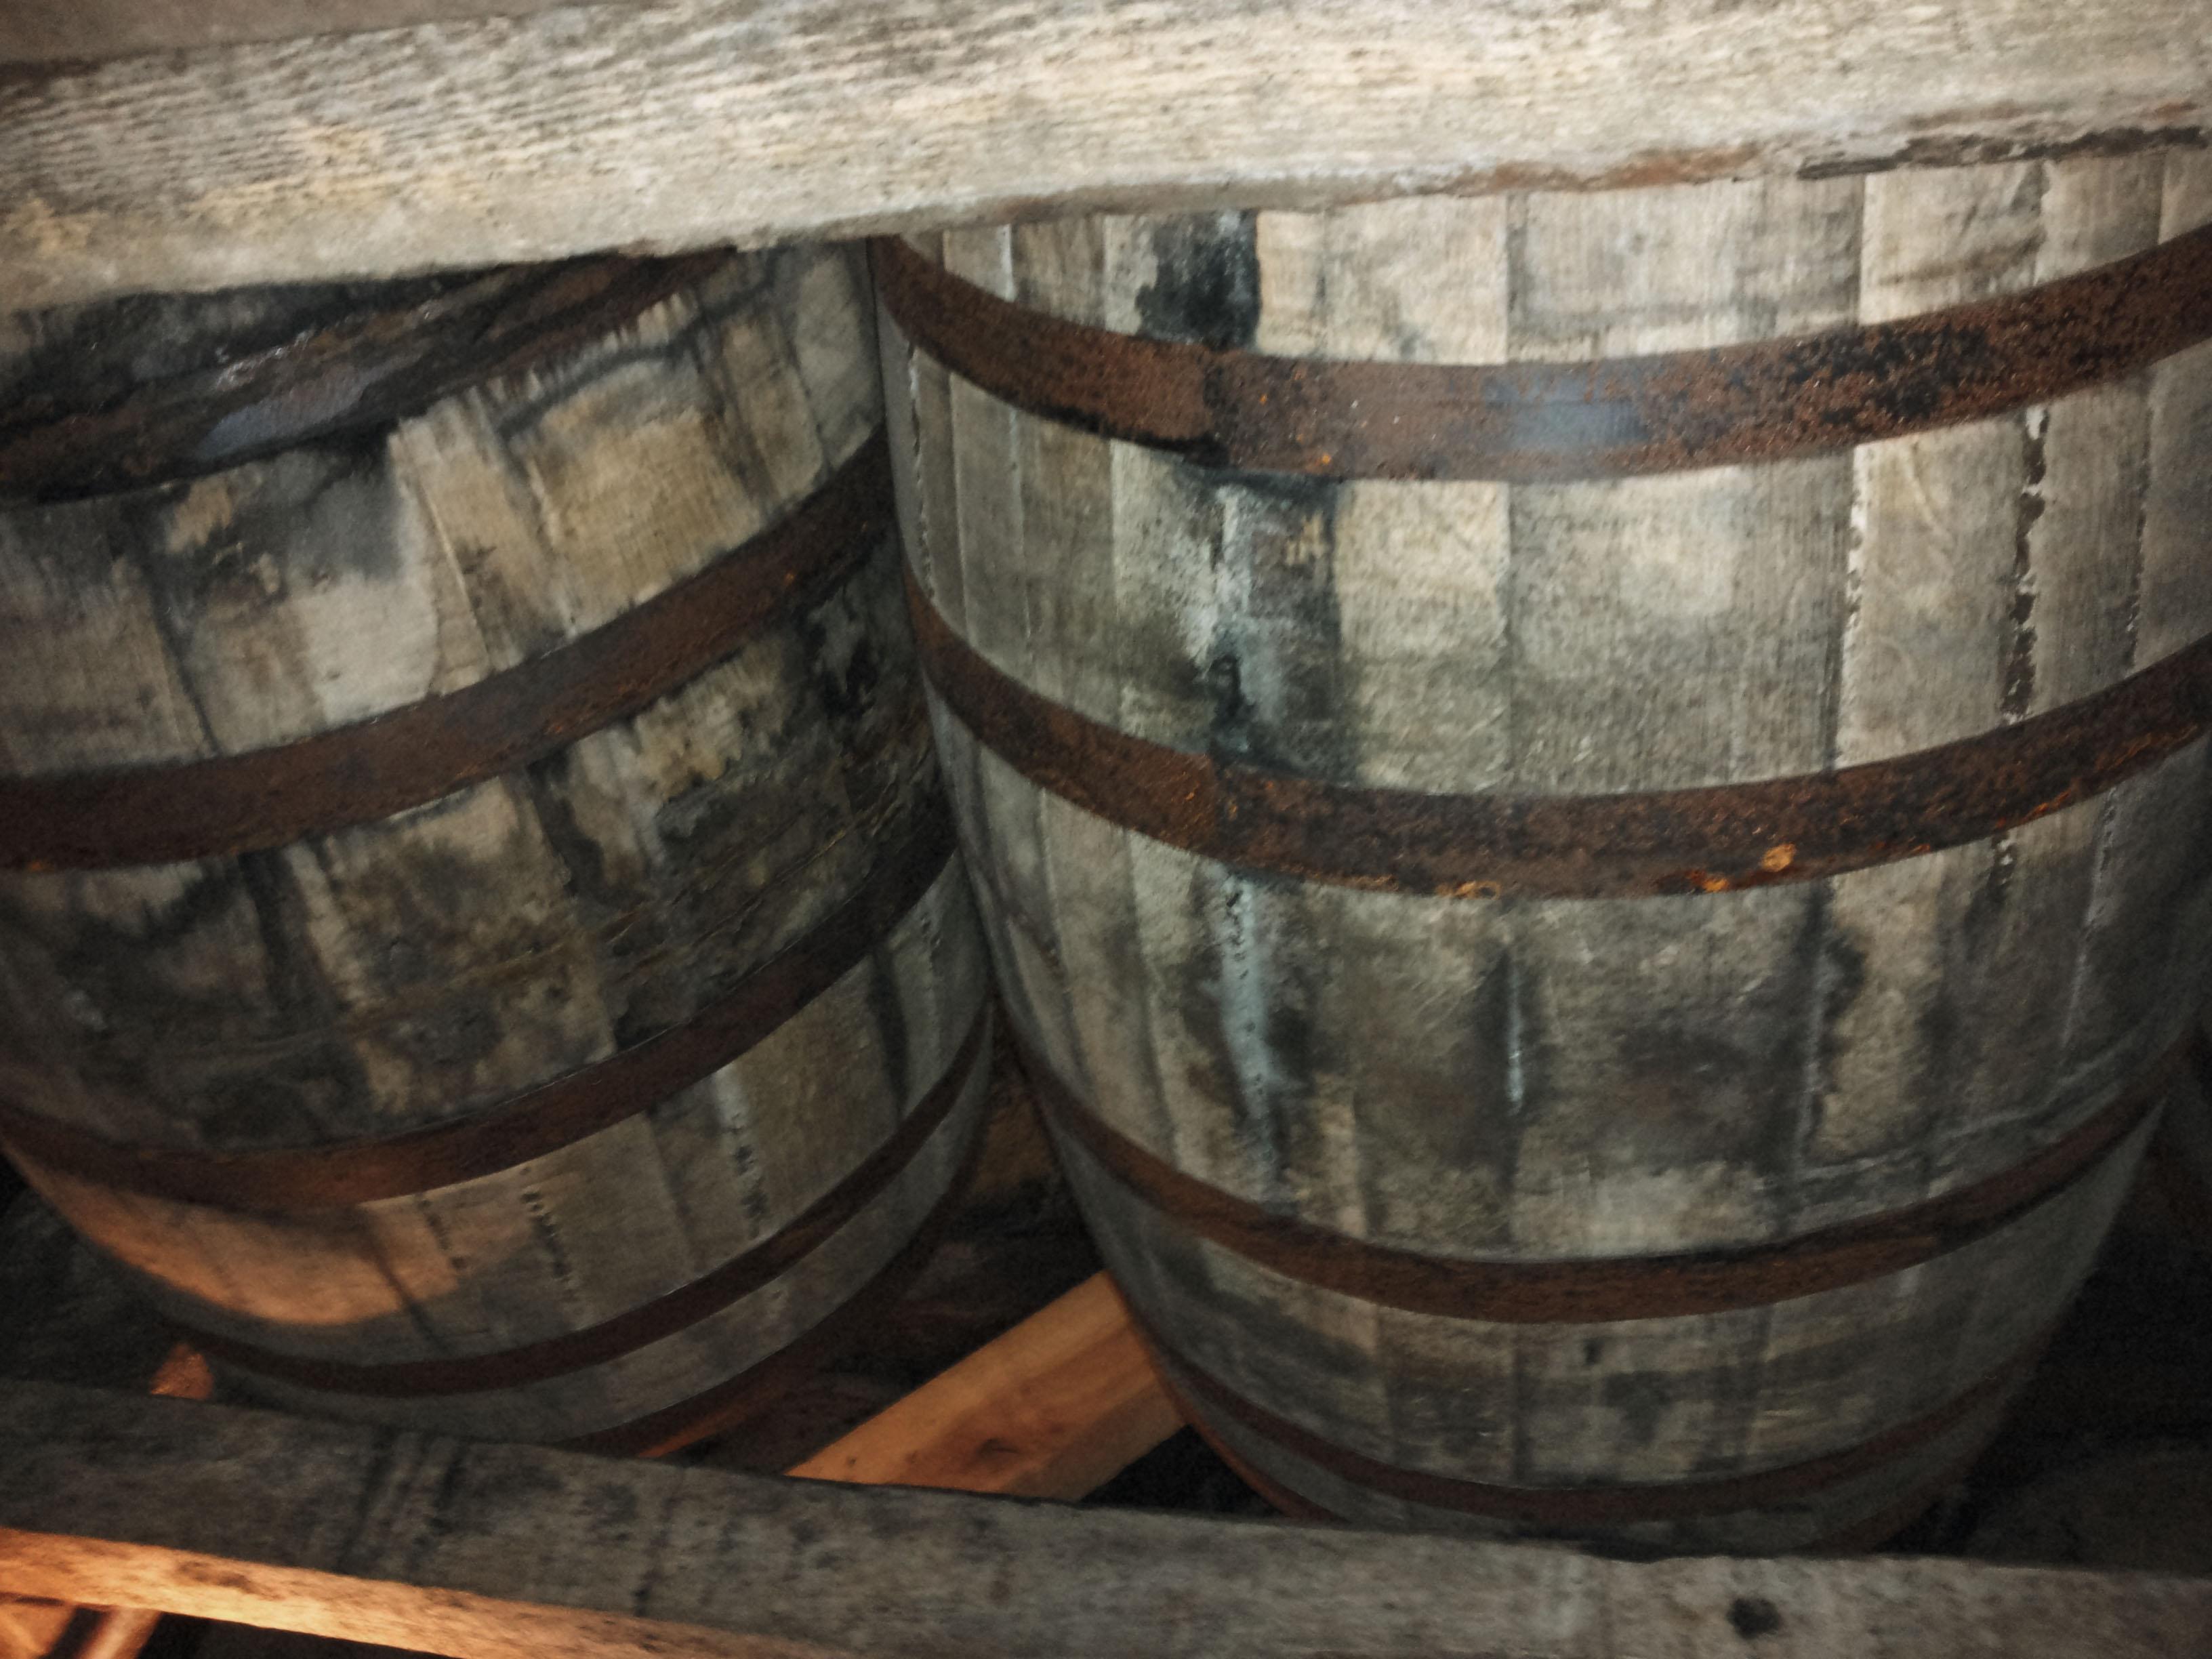 Jim Beam Distillery Barrels